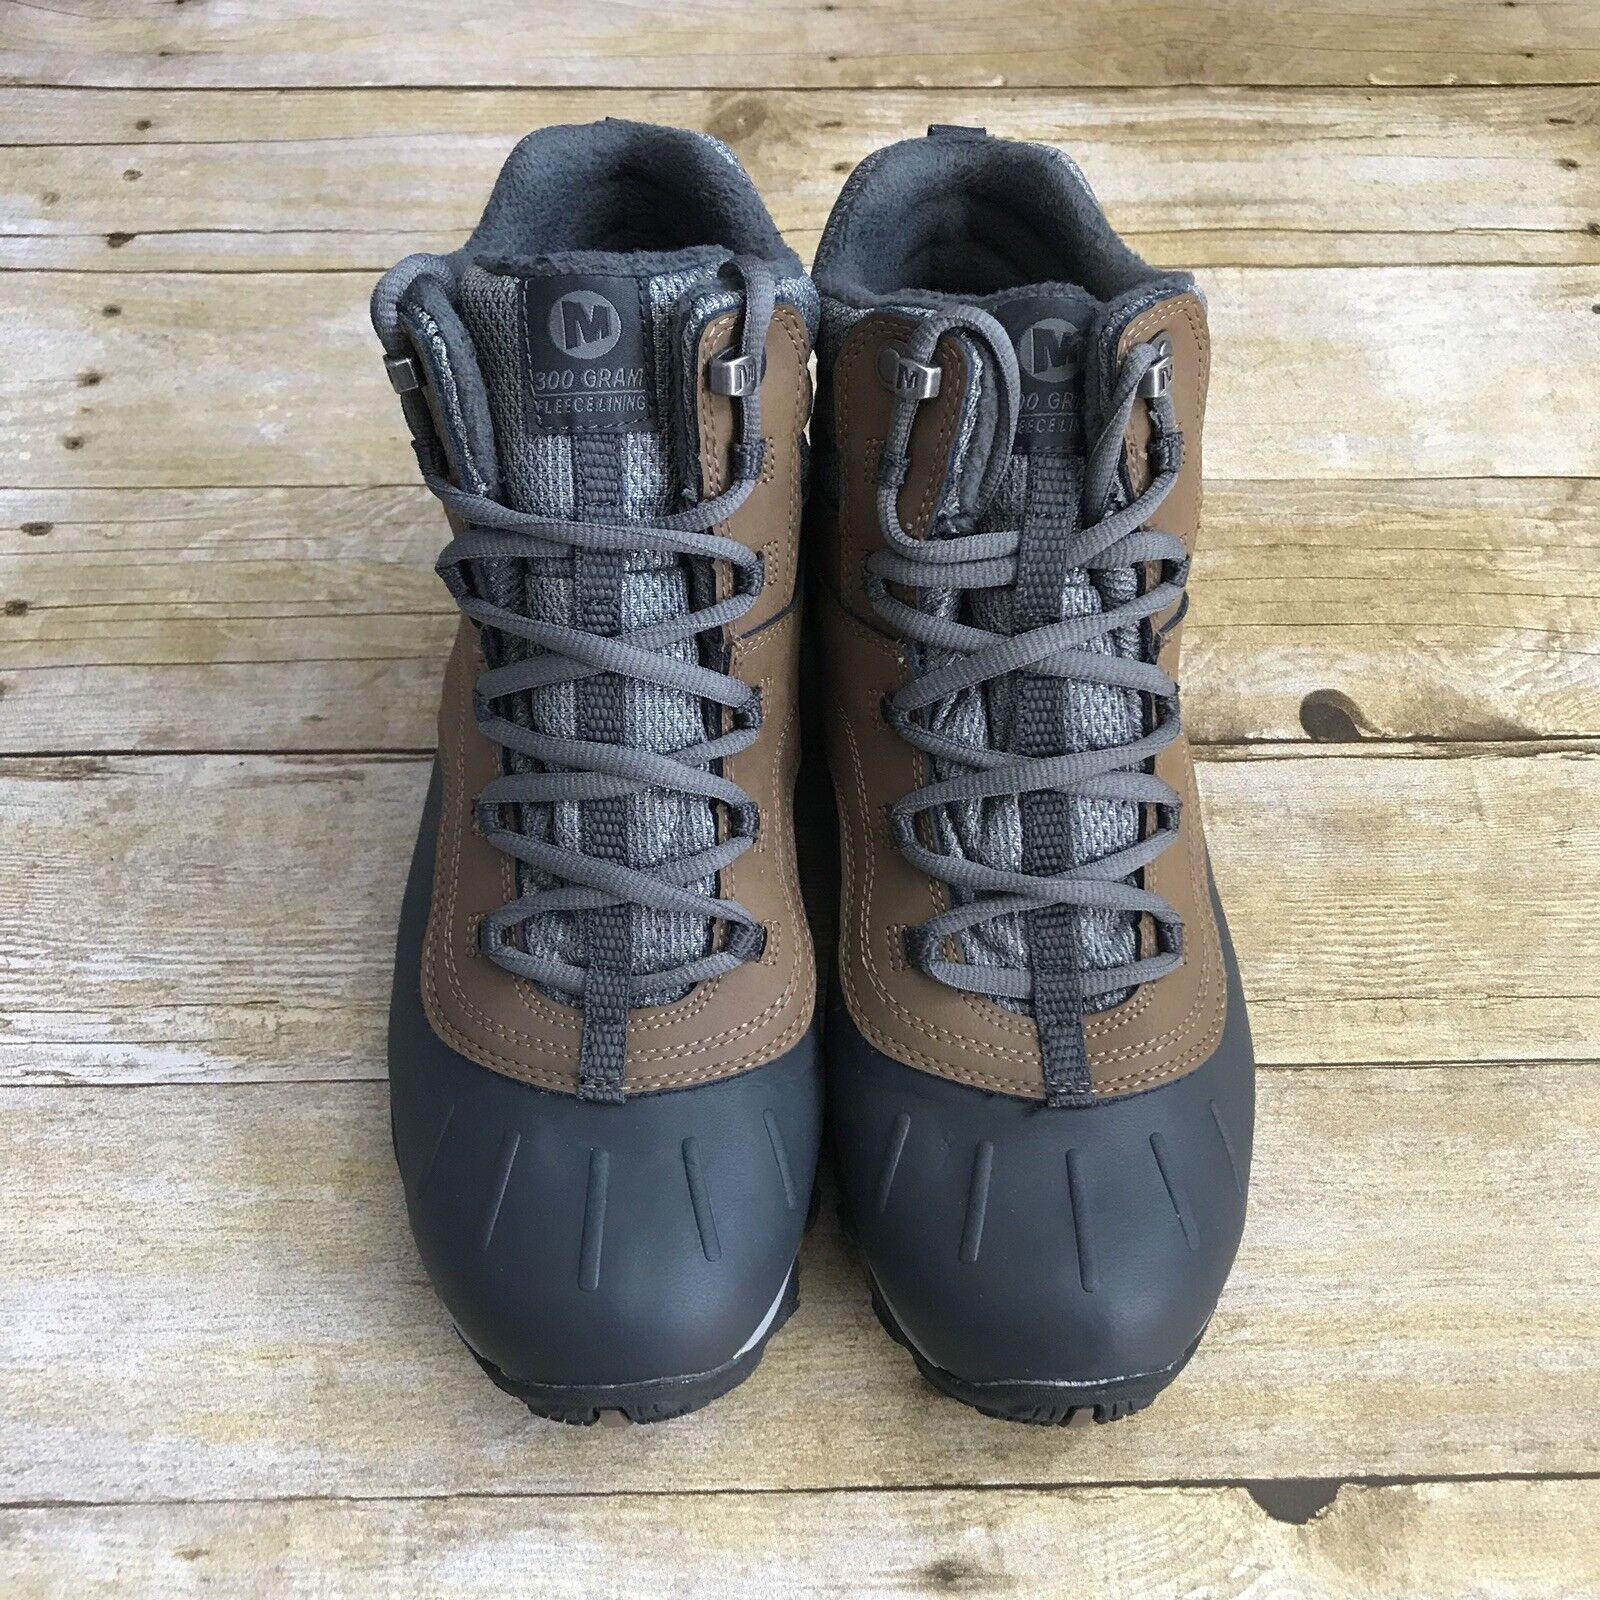 Merrell Herren Otter  Granite Performance Footwear Outdoor Stiefel J310970C Größe 9.5